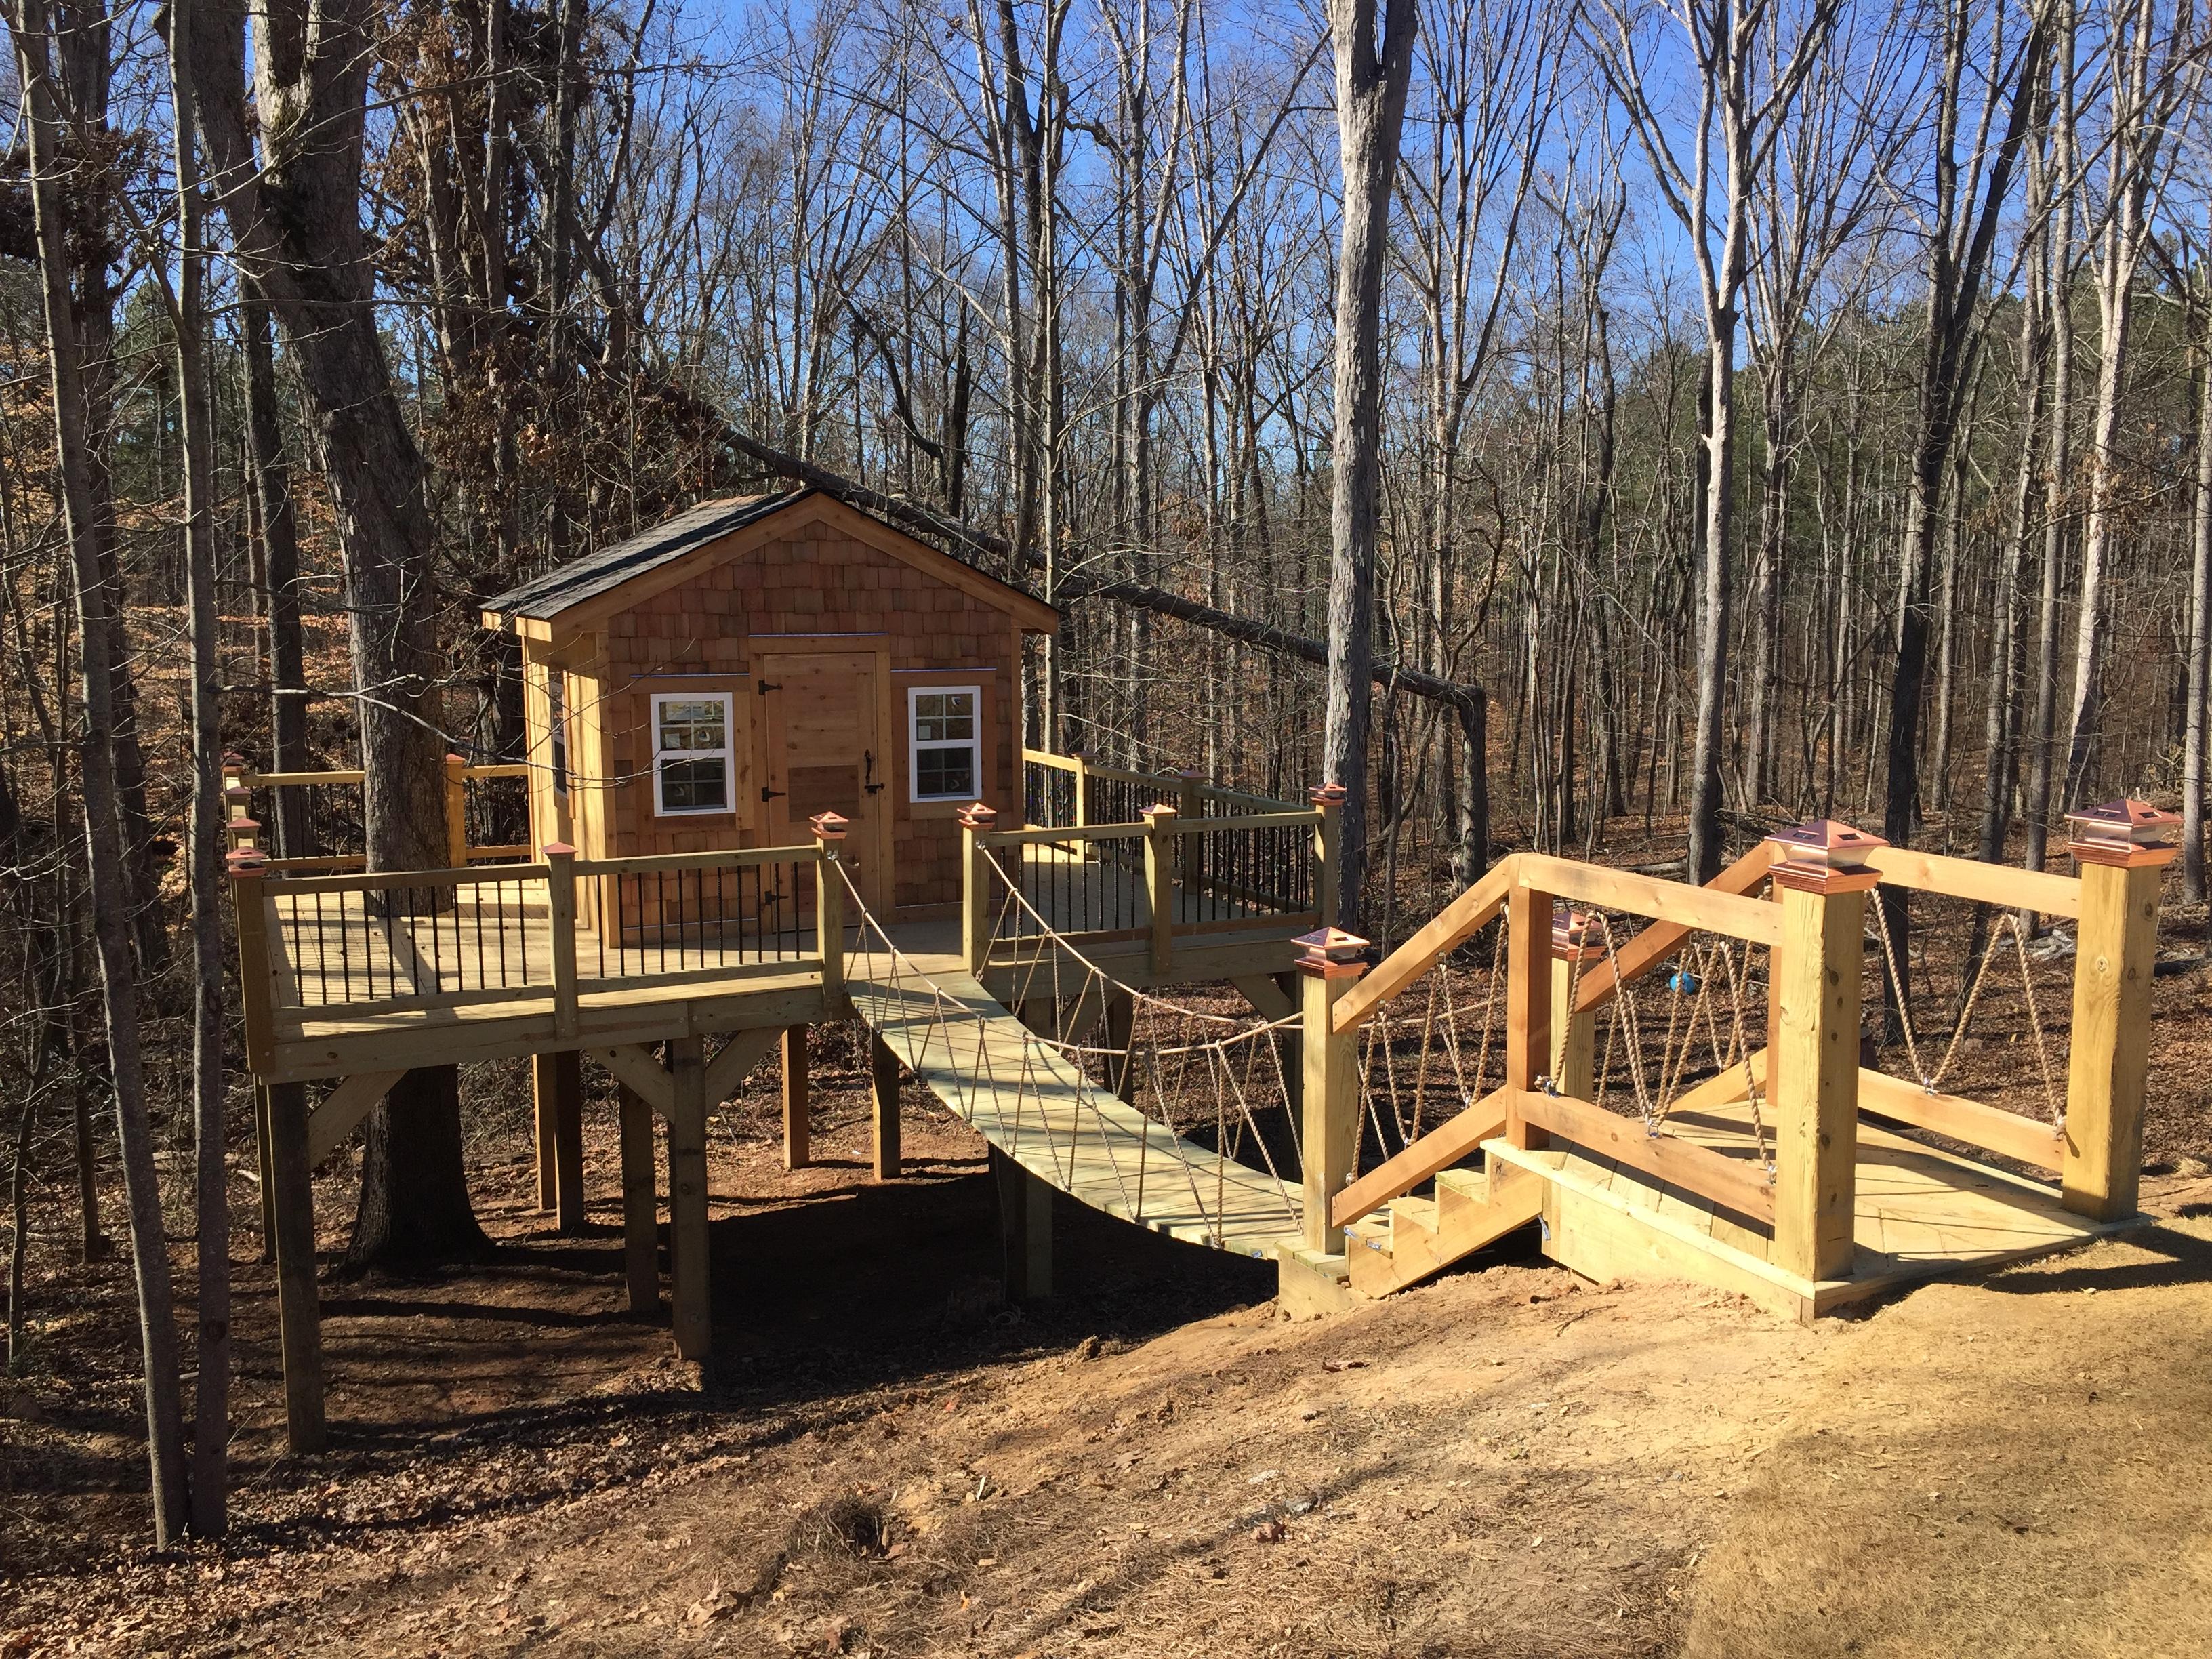 completed treehouse with rope bridge cedar siding Carrollton, GA